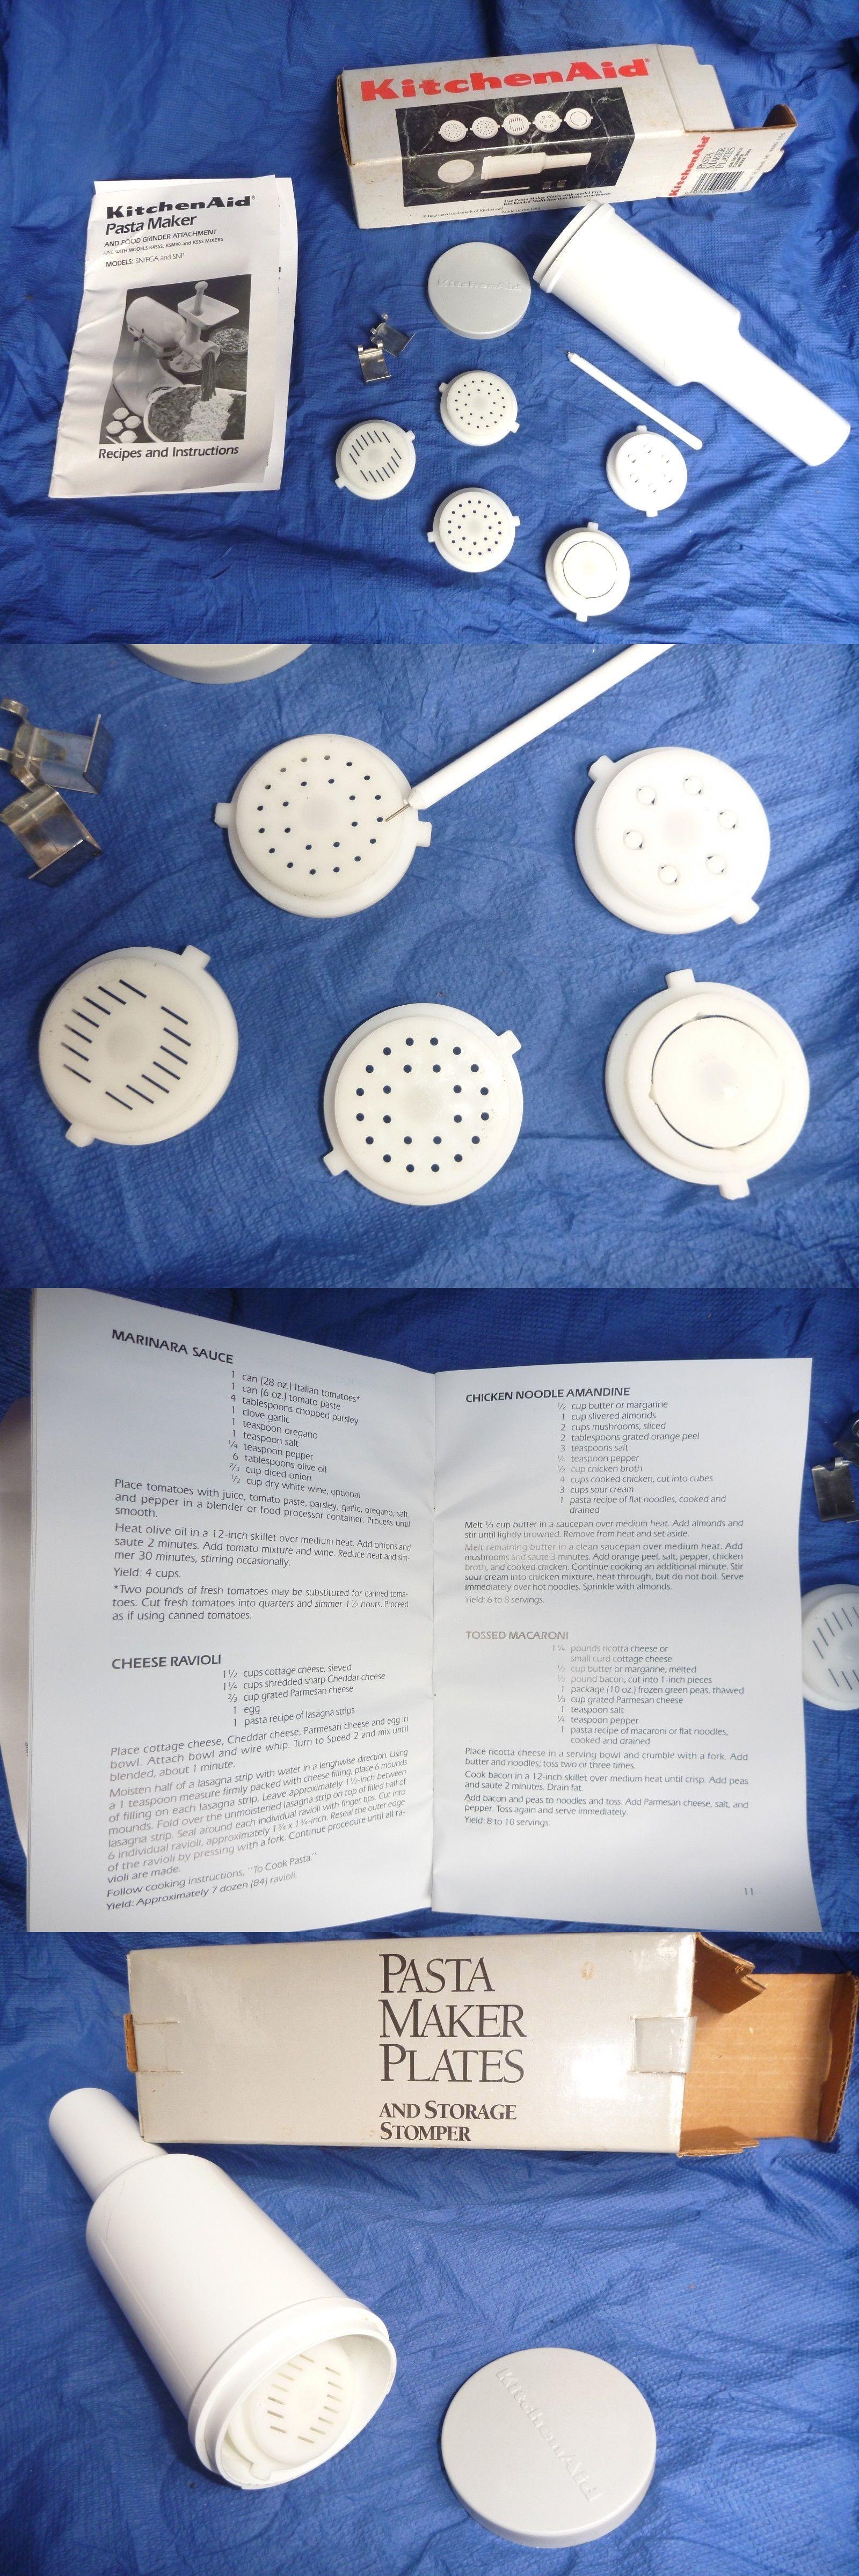 Pasta Makers 20680 Kitchenaid Mixer Pasta Maker Plates Dies W